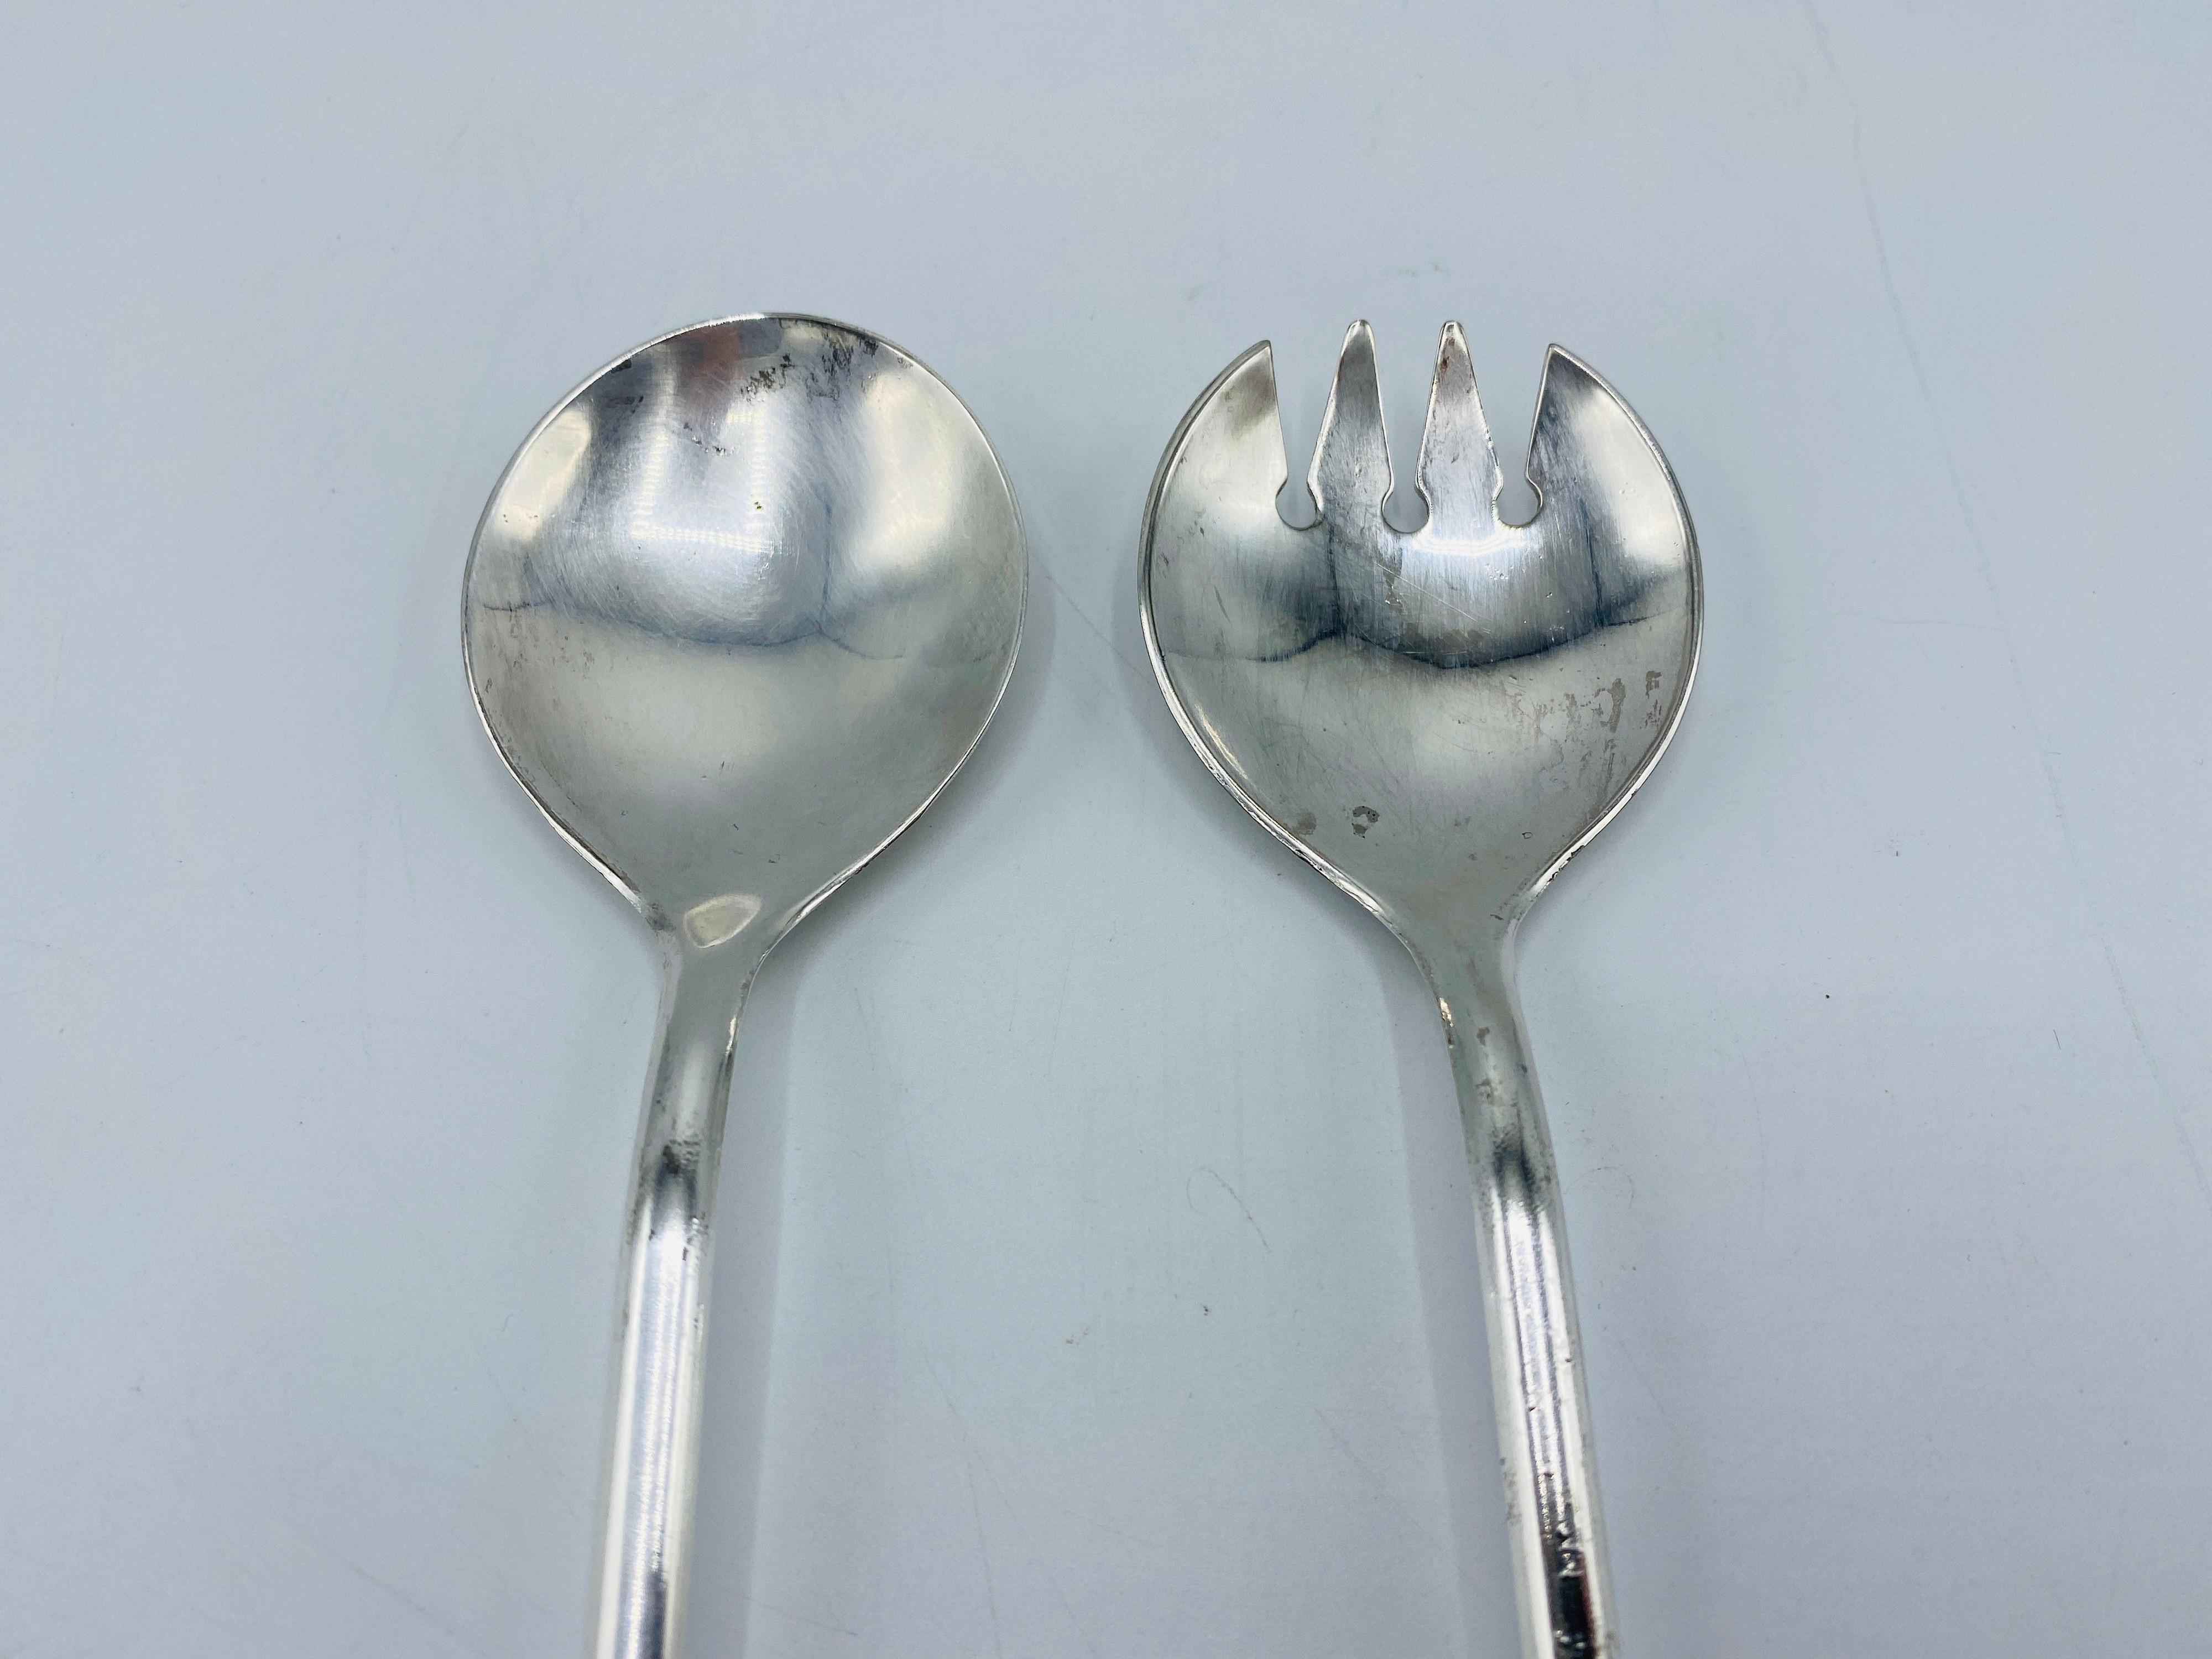 Silver Salad Serving Set Vintage 1960/'s Silver Plate Serving Spoon Fork Italy Dining Entertaining Serving Utensil